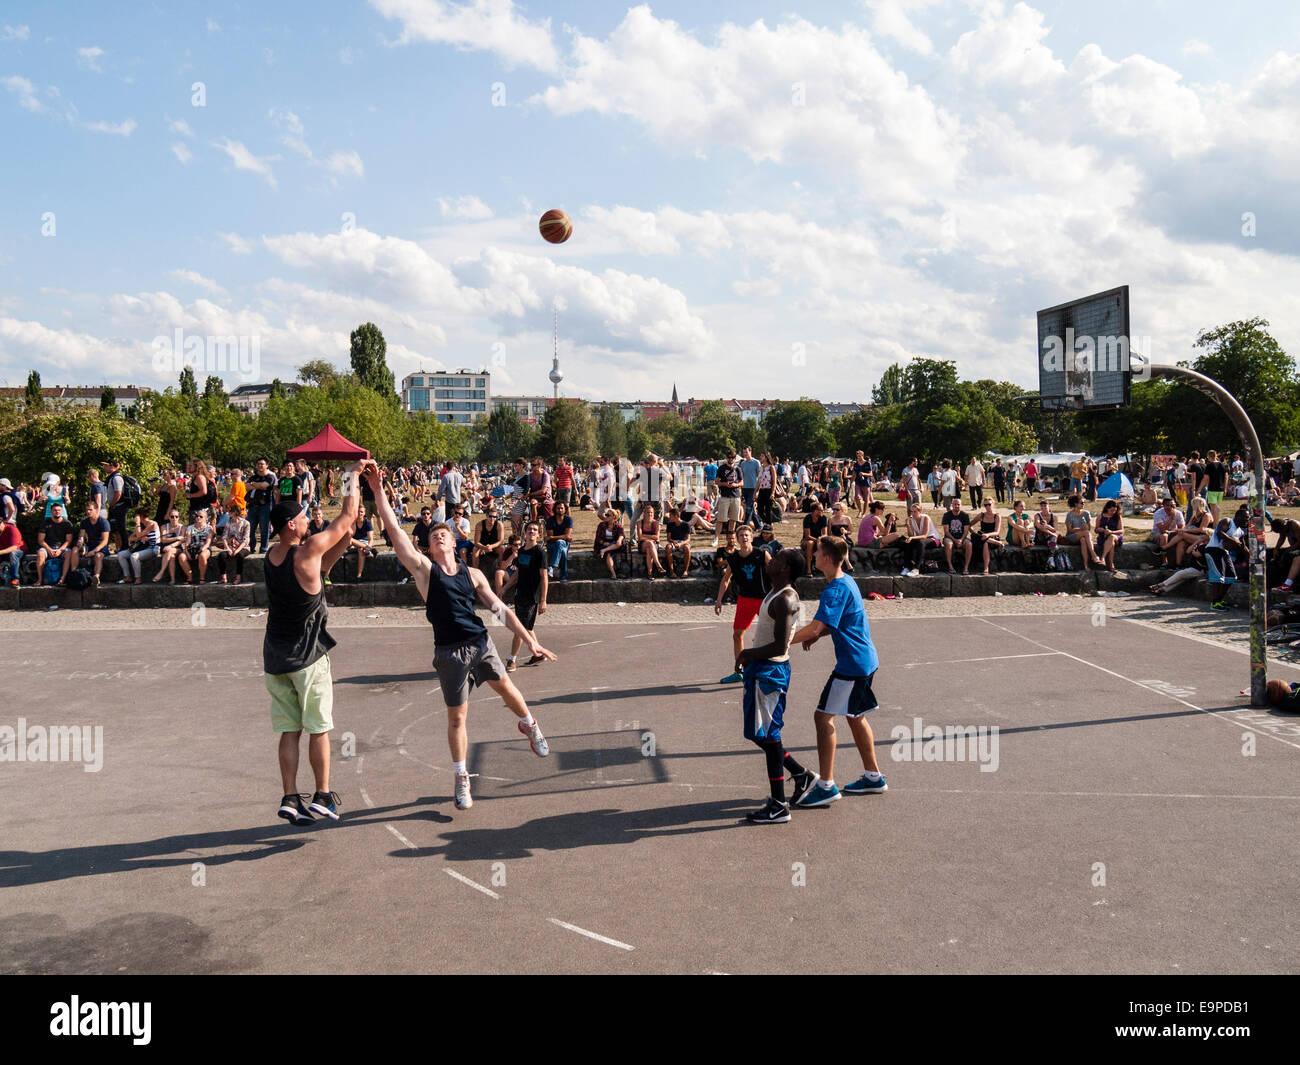 Baloncesto en Mauerpark, Berlín, GermanyEurope Imagen De Stock